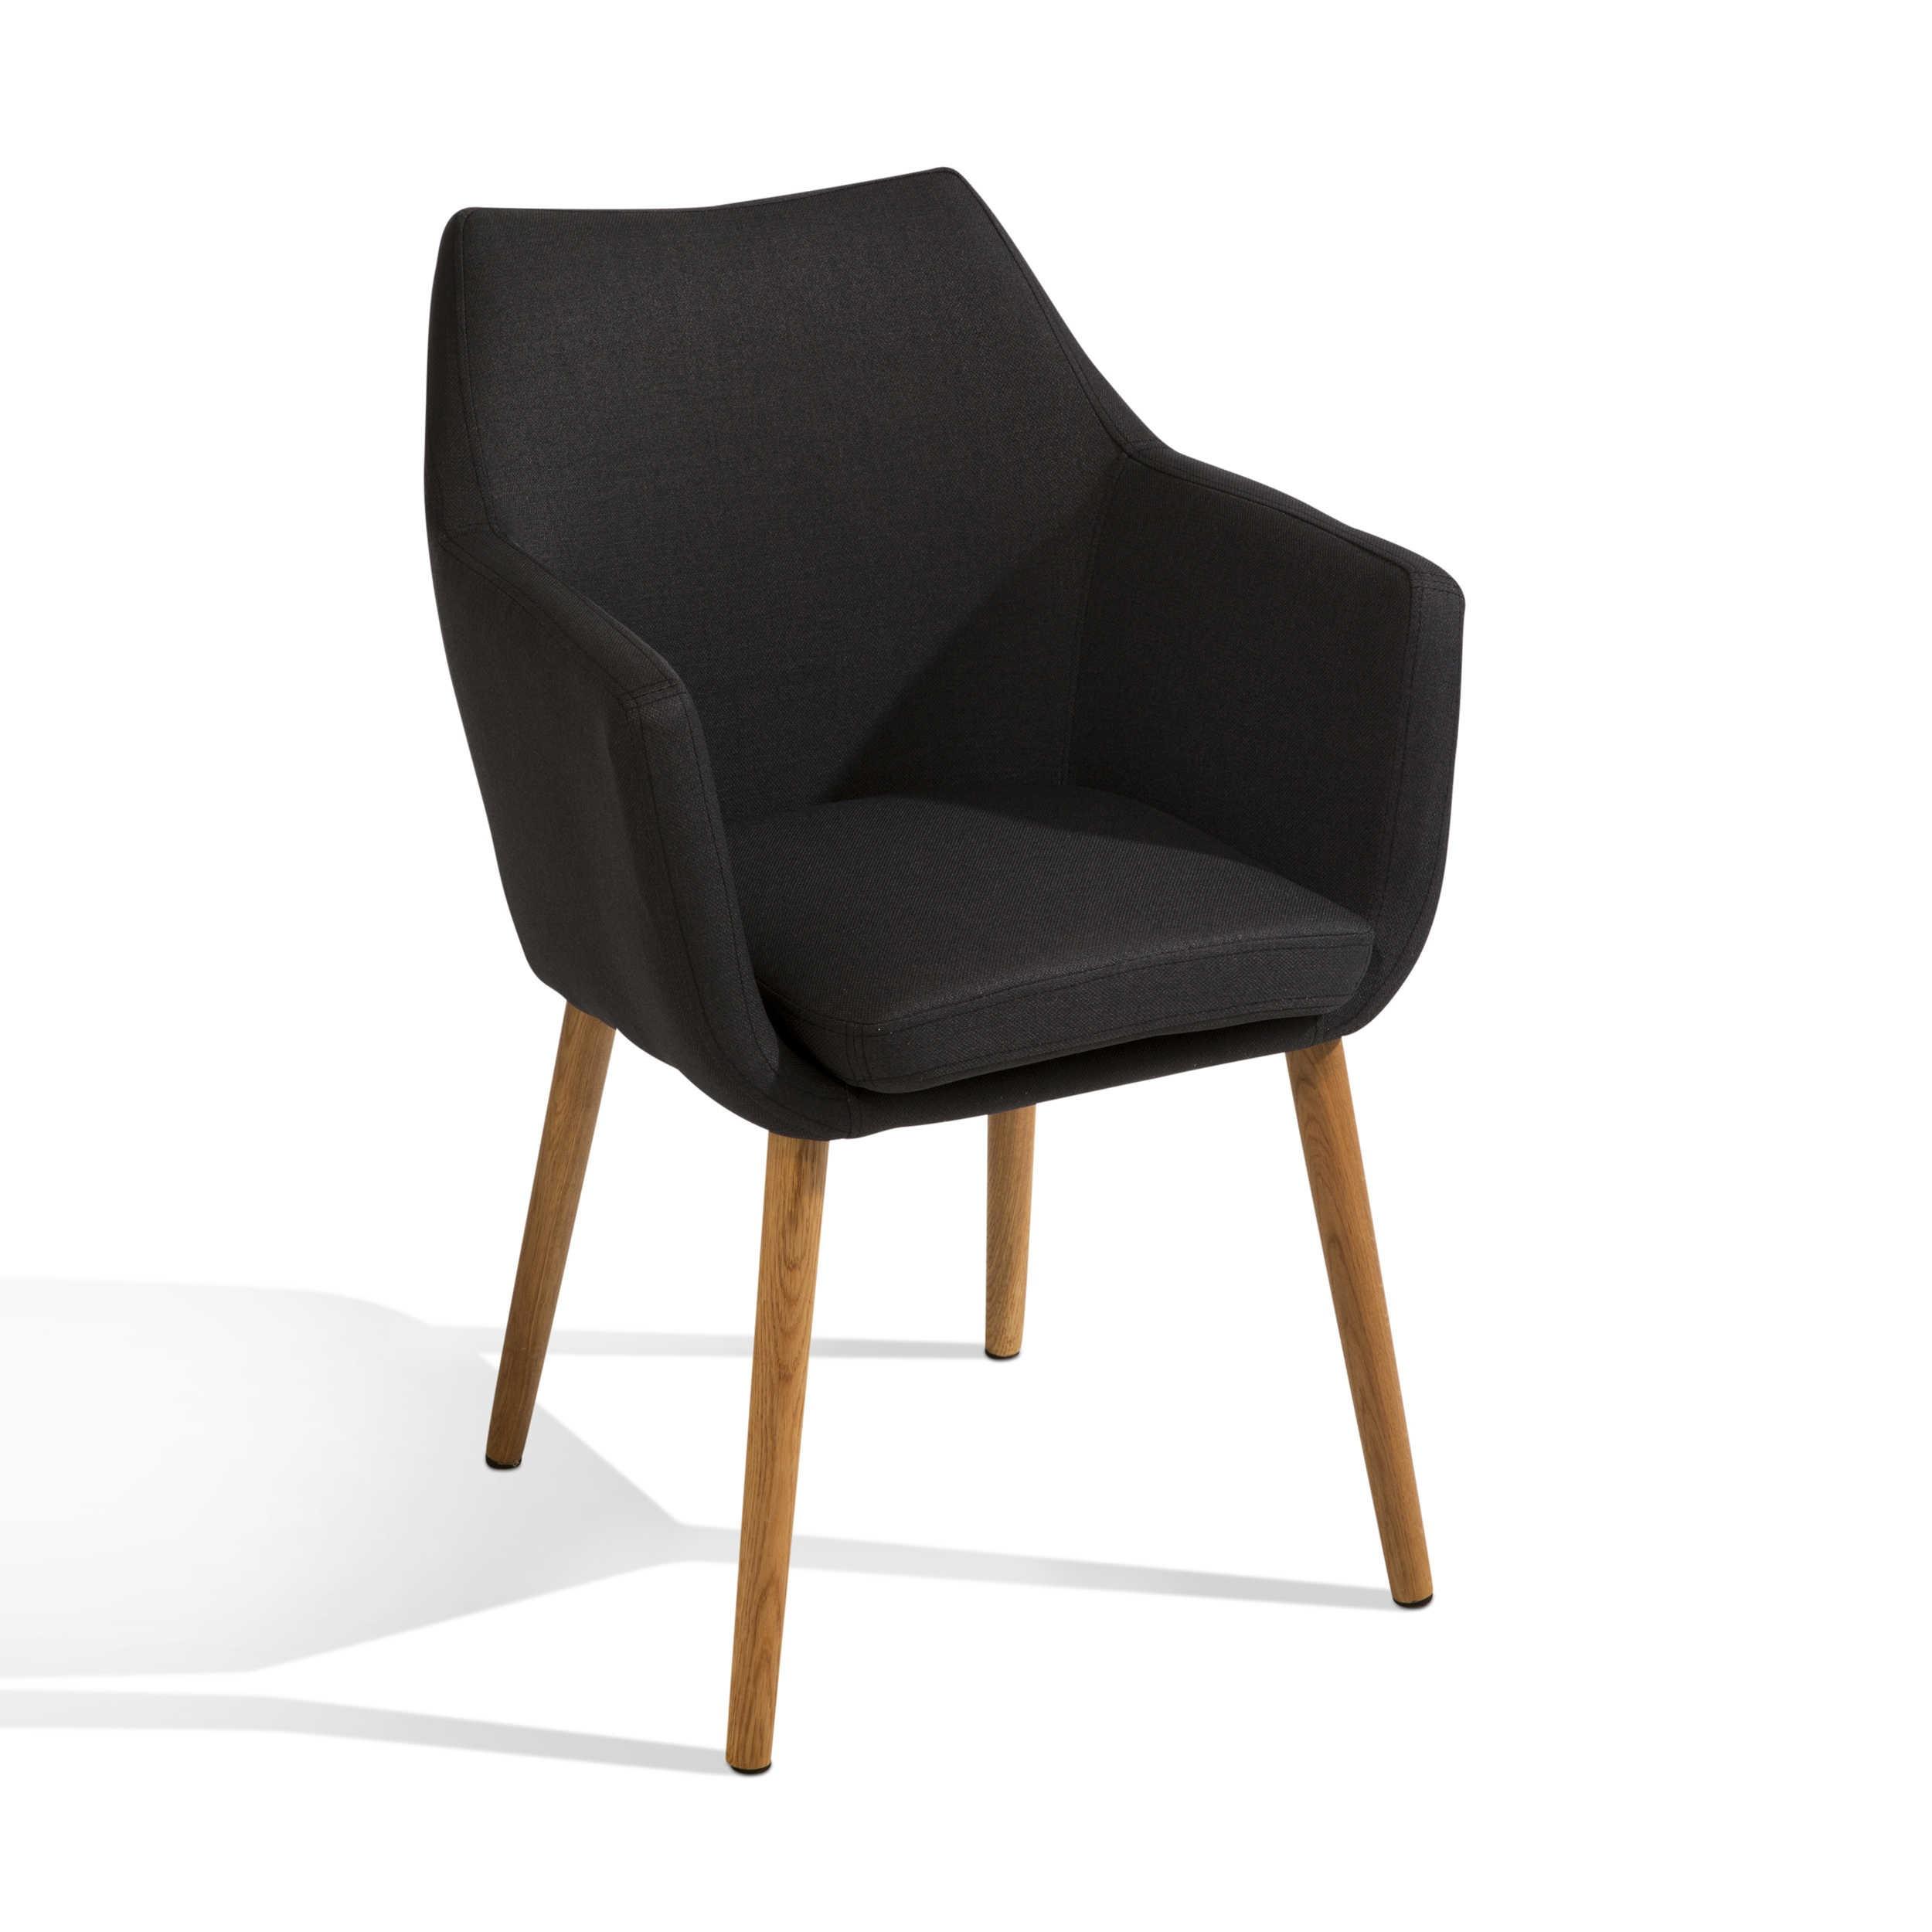 actona stuhl petrulli anthrazit stoff online kaufen bei woonio. Black Bedroom Furniture Sets. Home Design Ideas